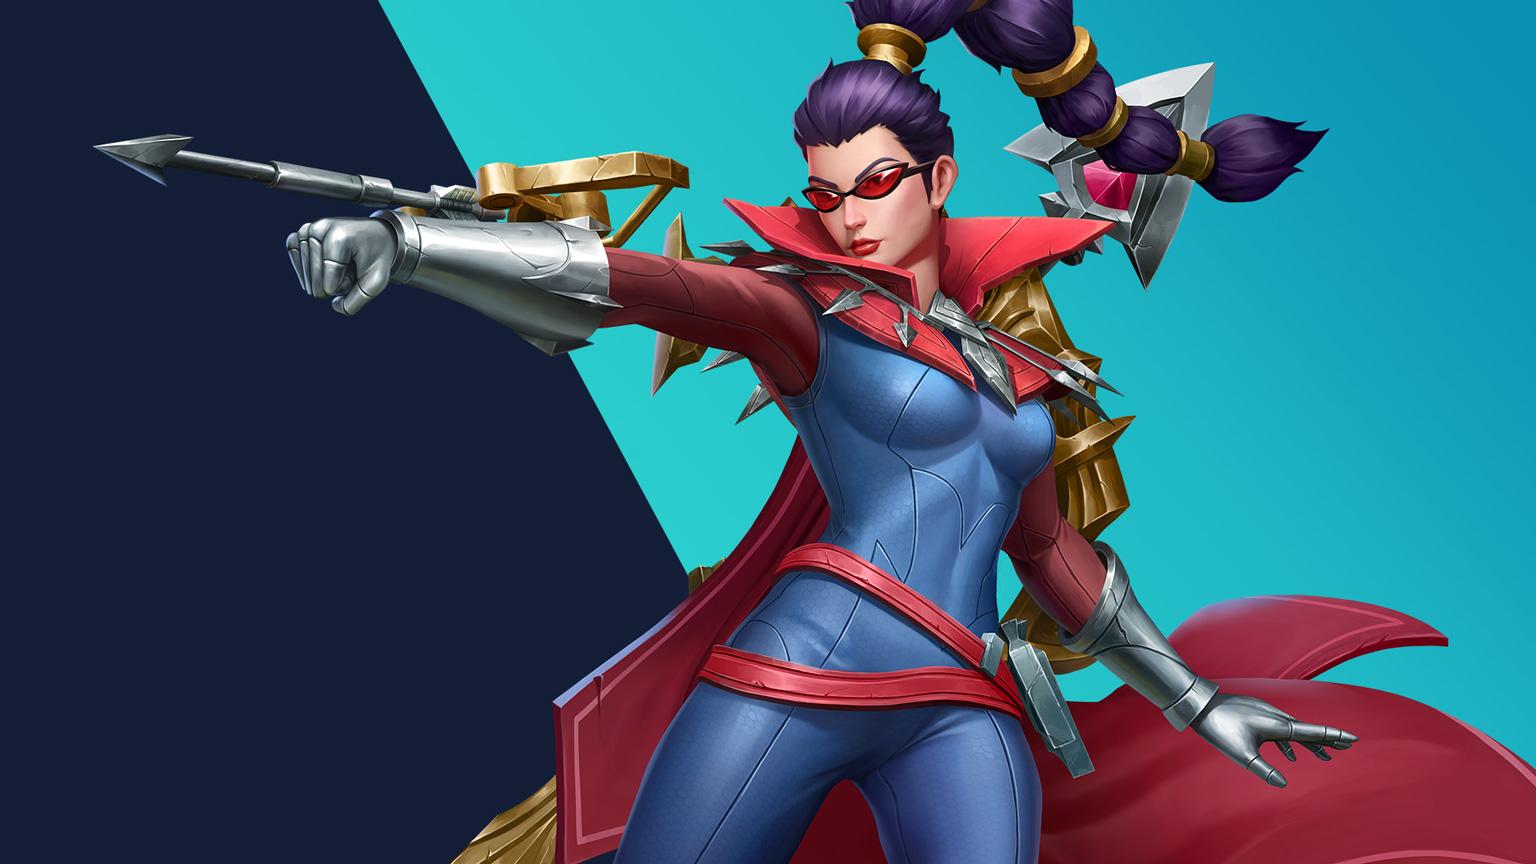 hero background